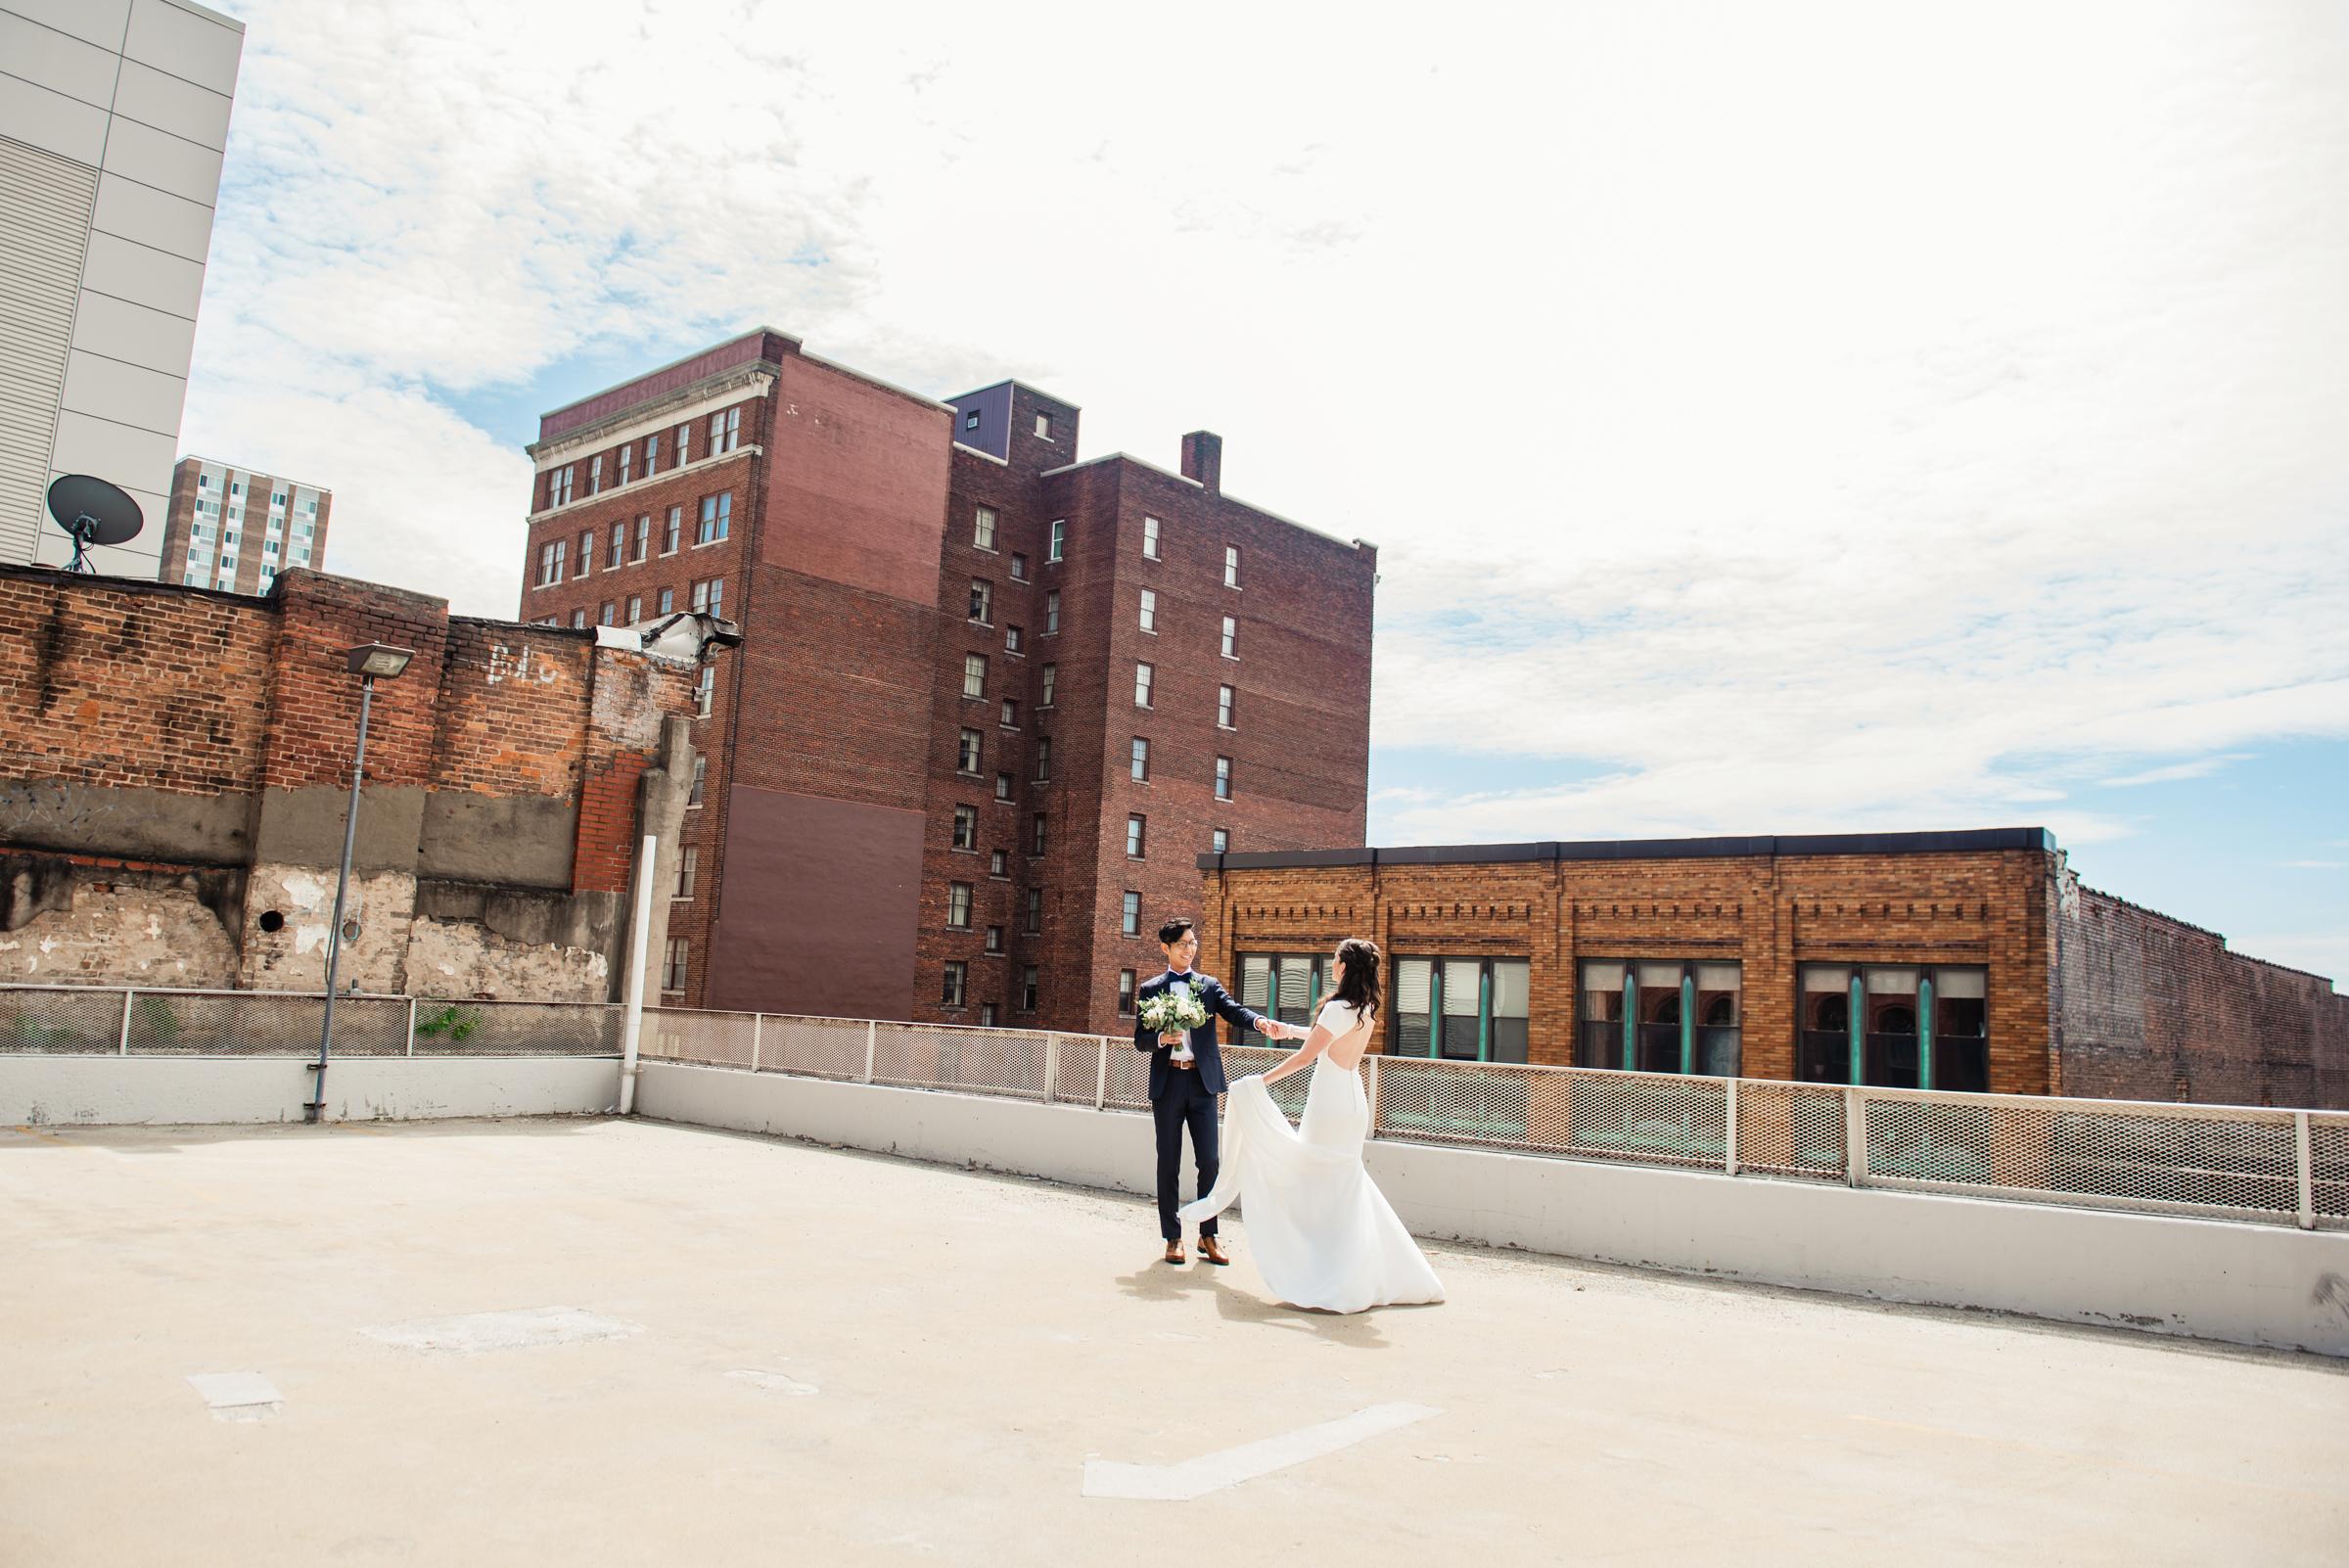 SKY_Armory_Syracuse_Wedding_JILL_STUDIO_Rochester_NY_Photographer_DSC_5268.jpg